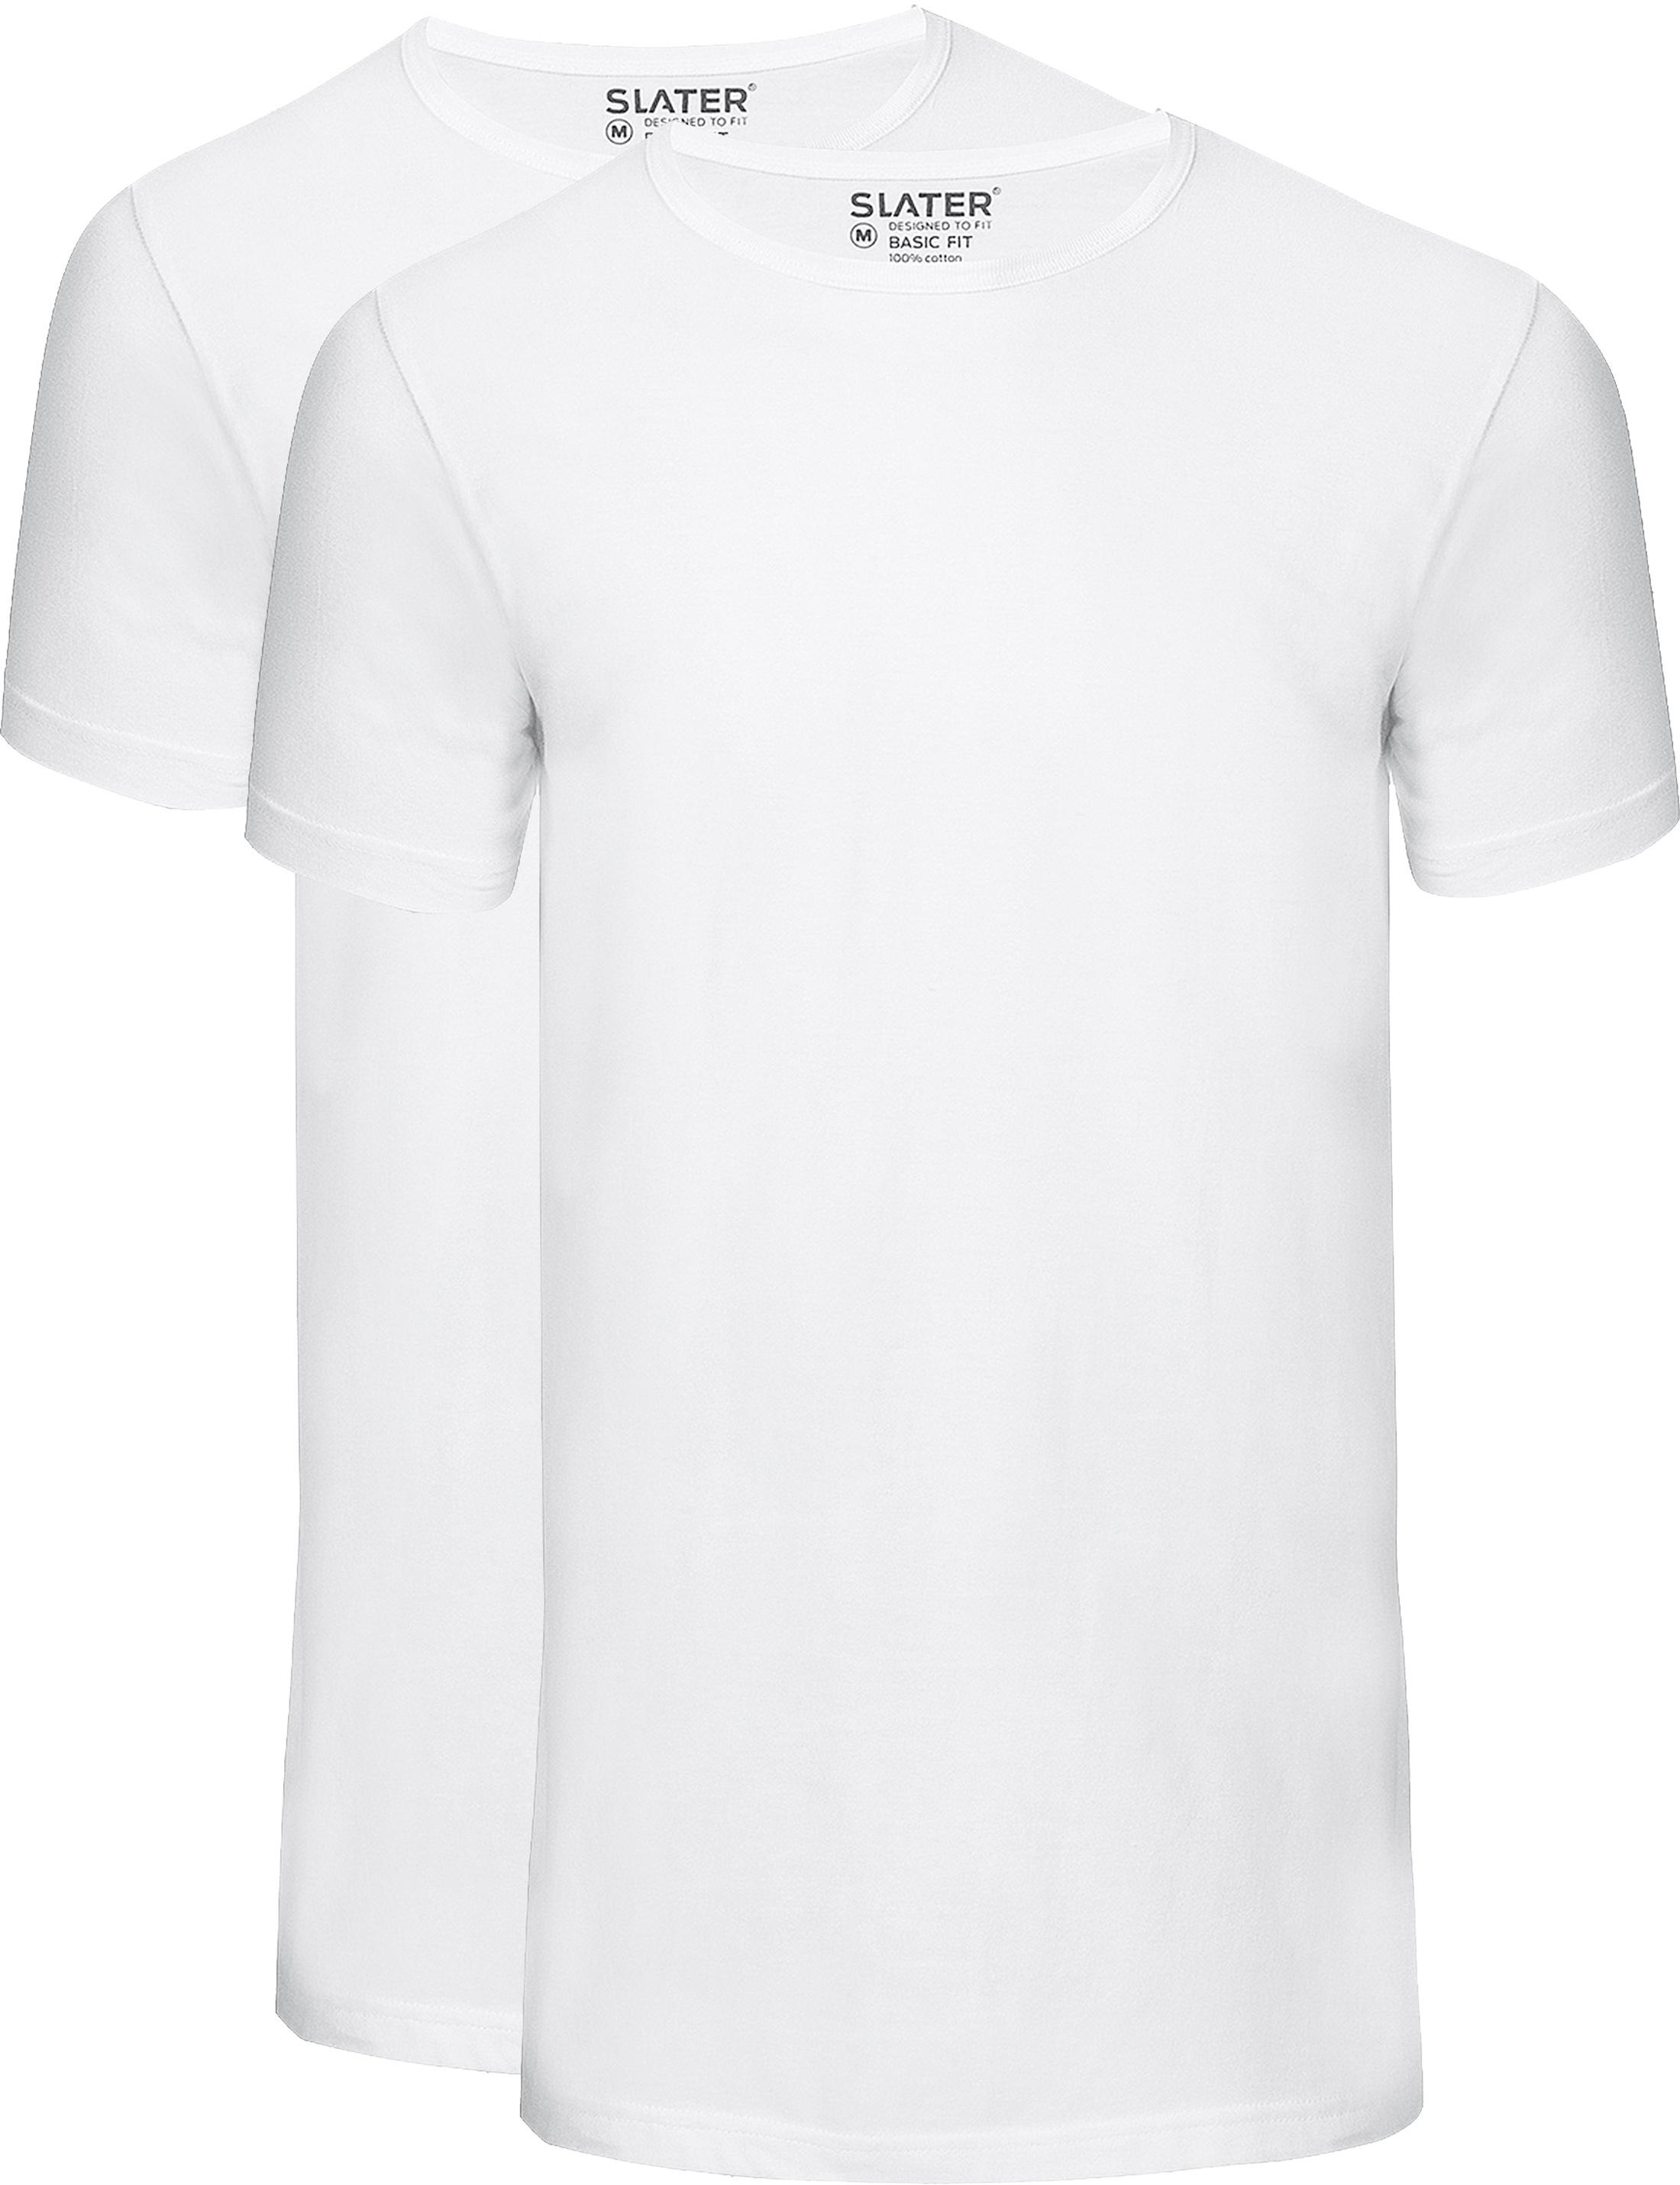 Slater 2er-Pack Basic Fit T-shirt Weiß